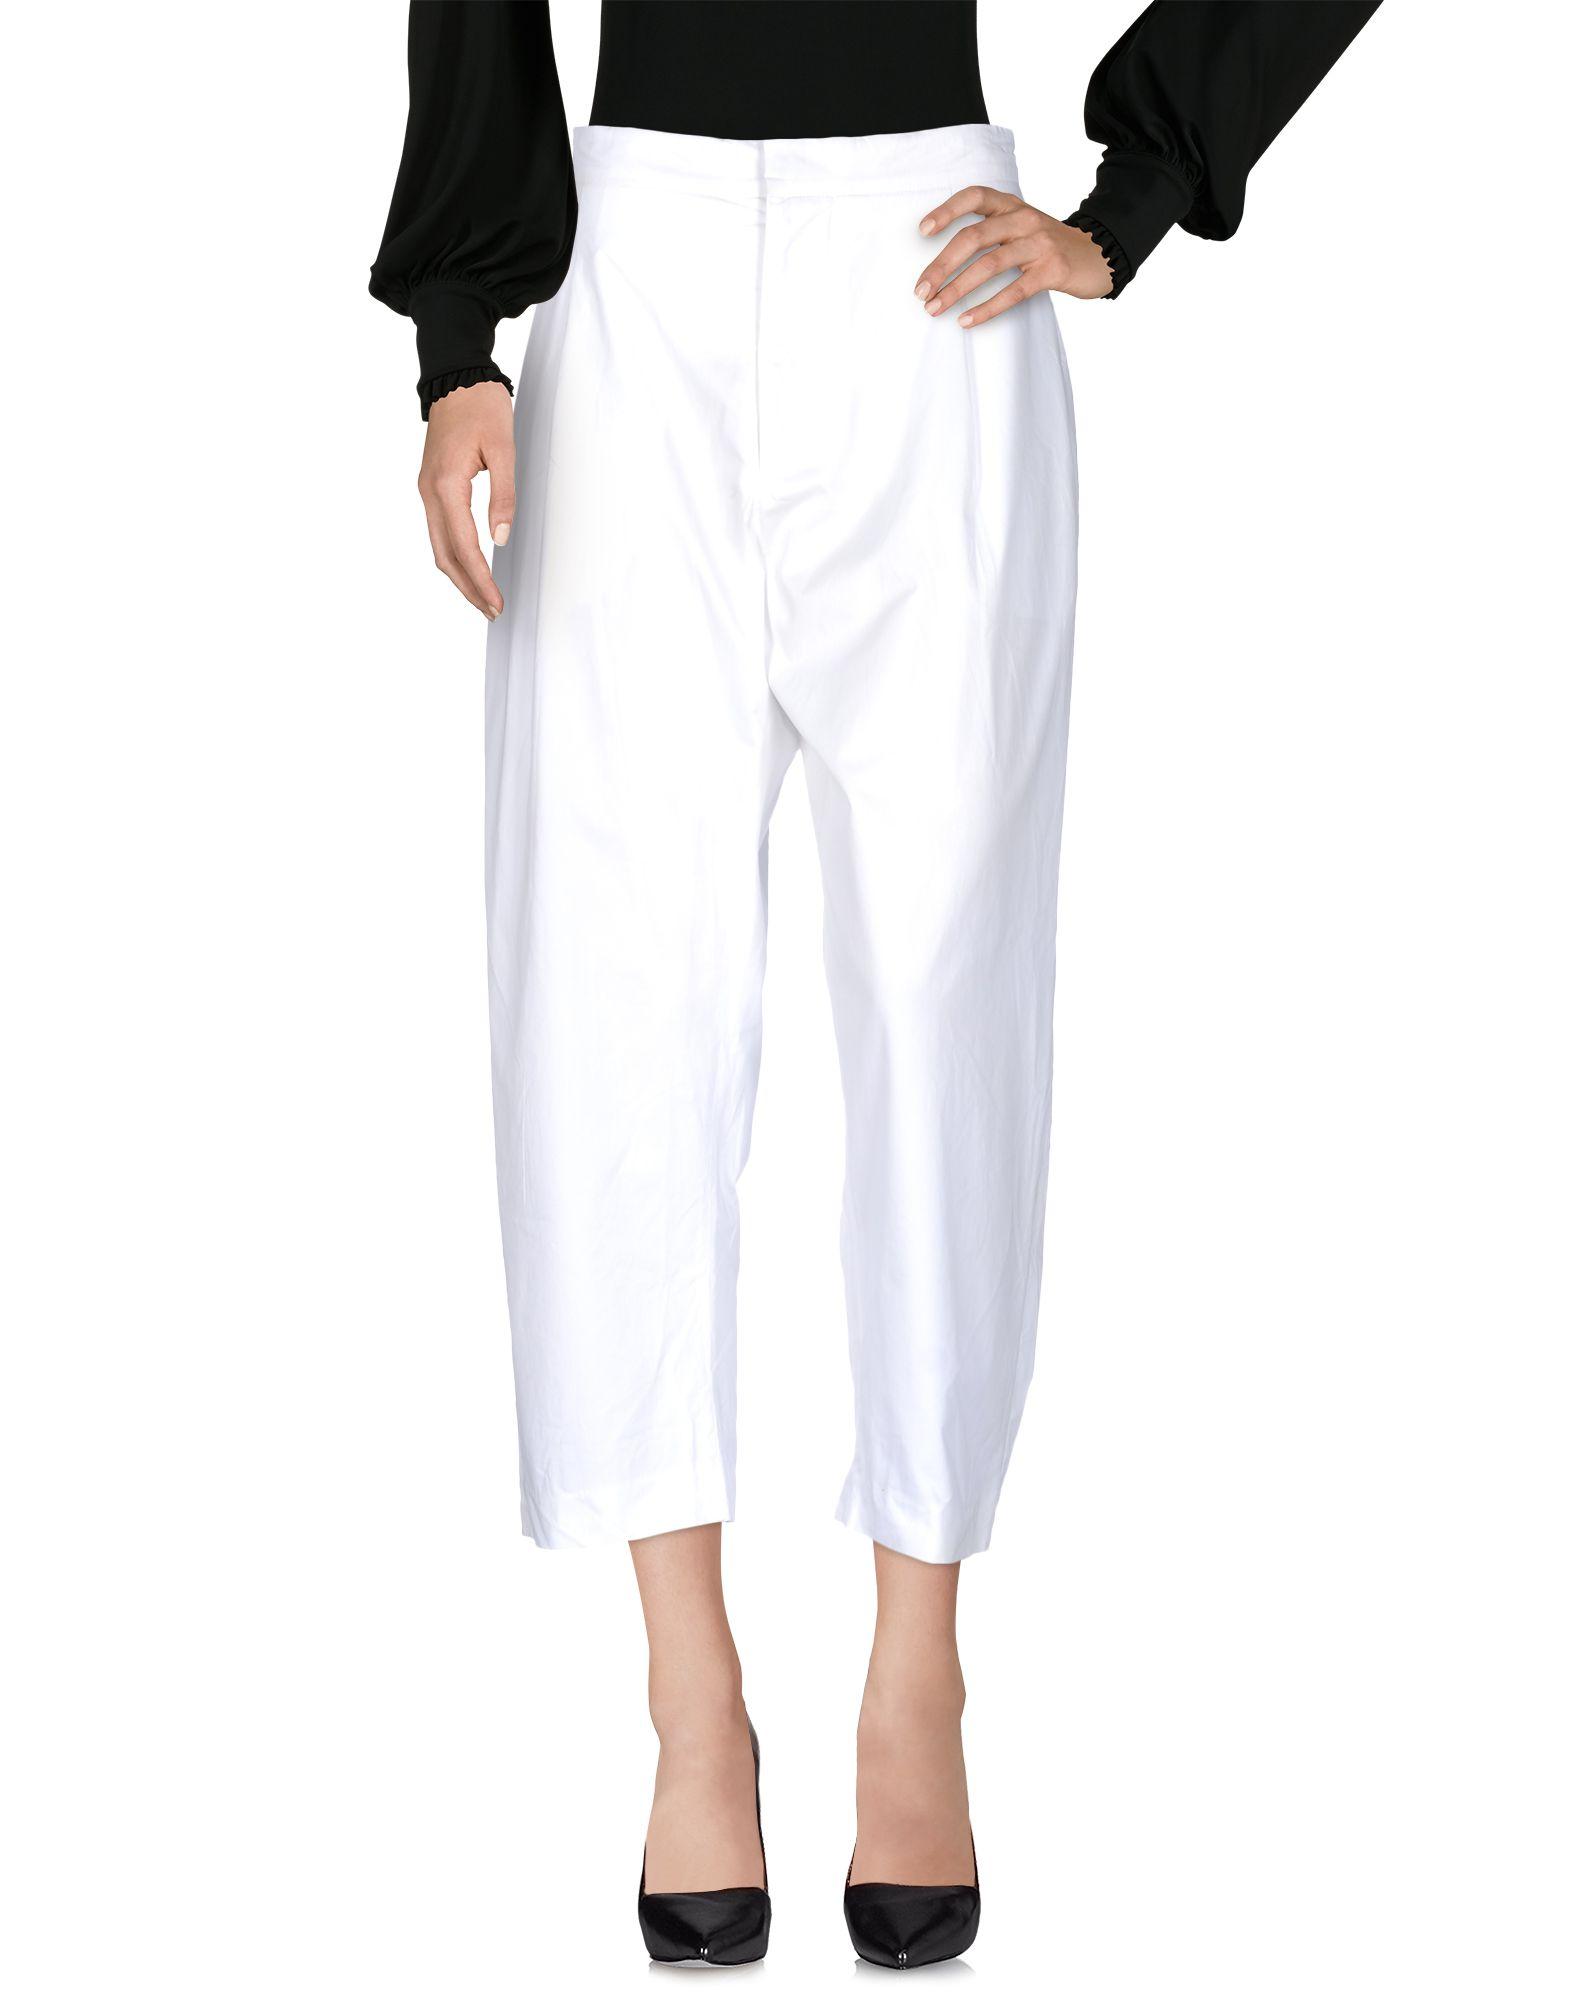 Pantalone Marni Donna - Acquista online su DY6uJOORw